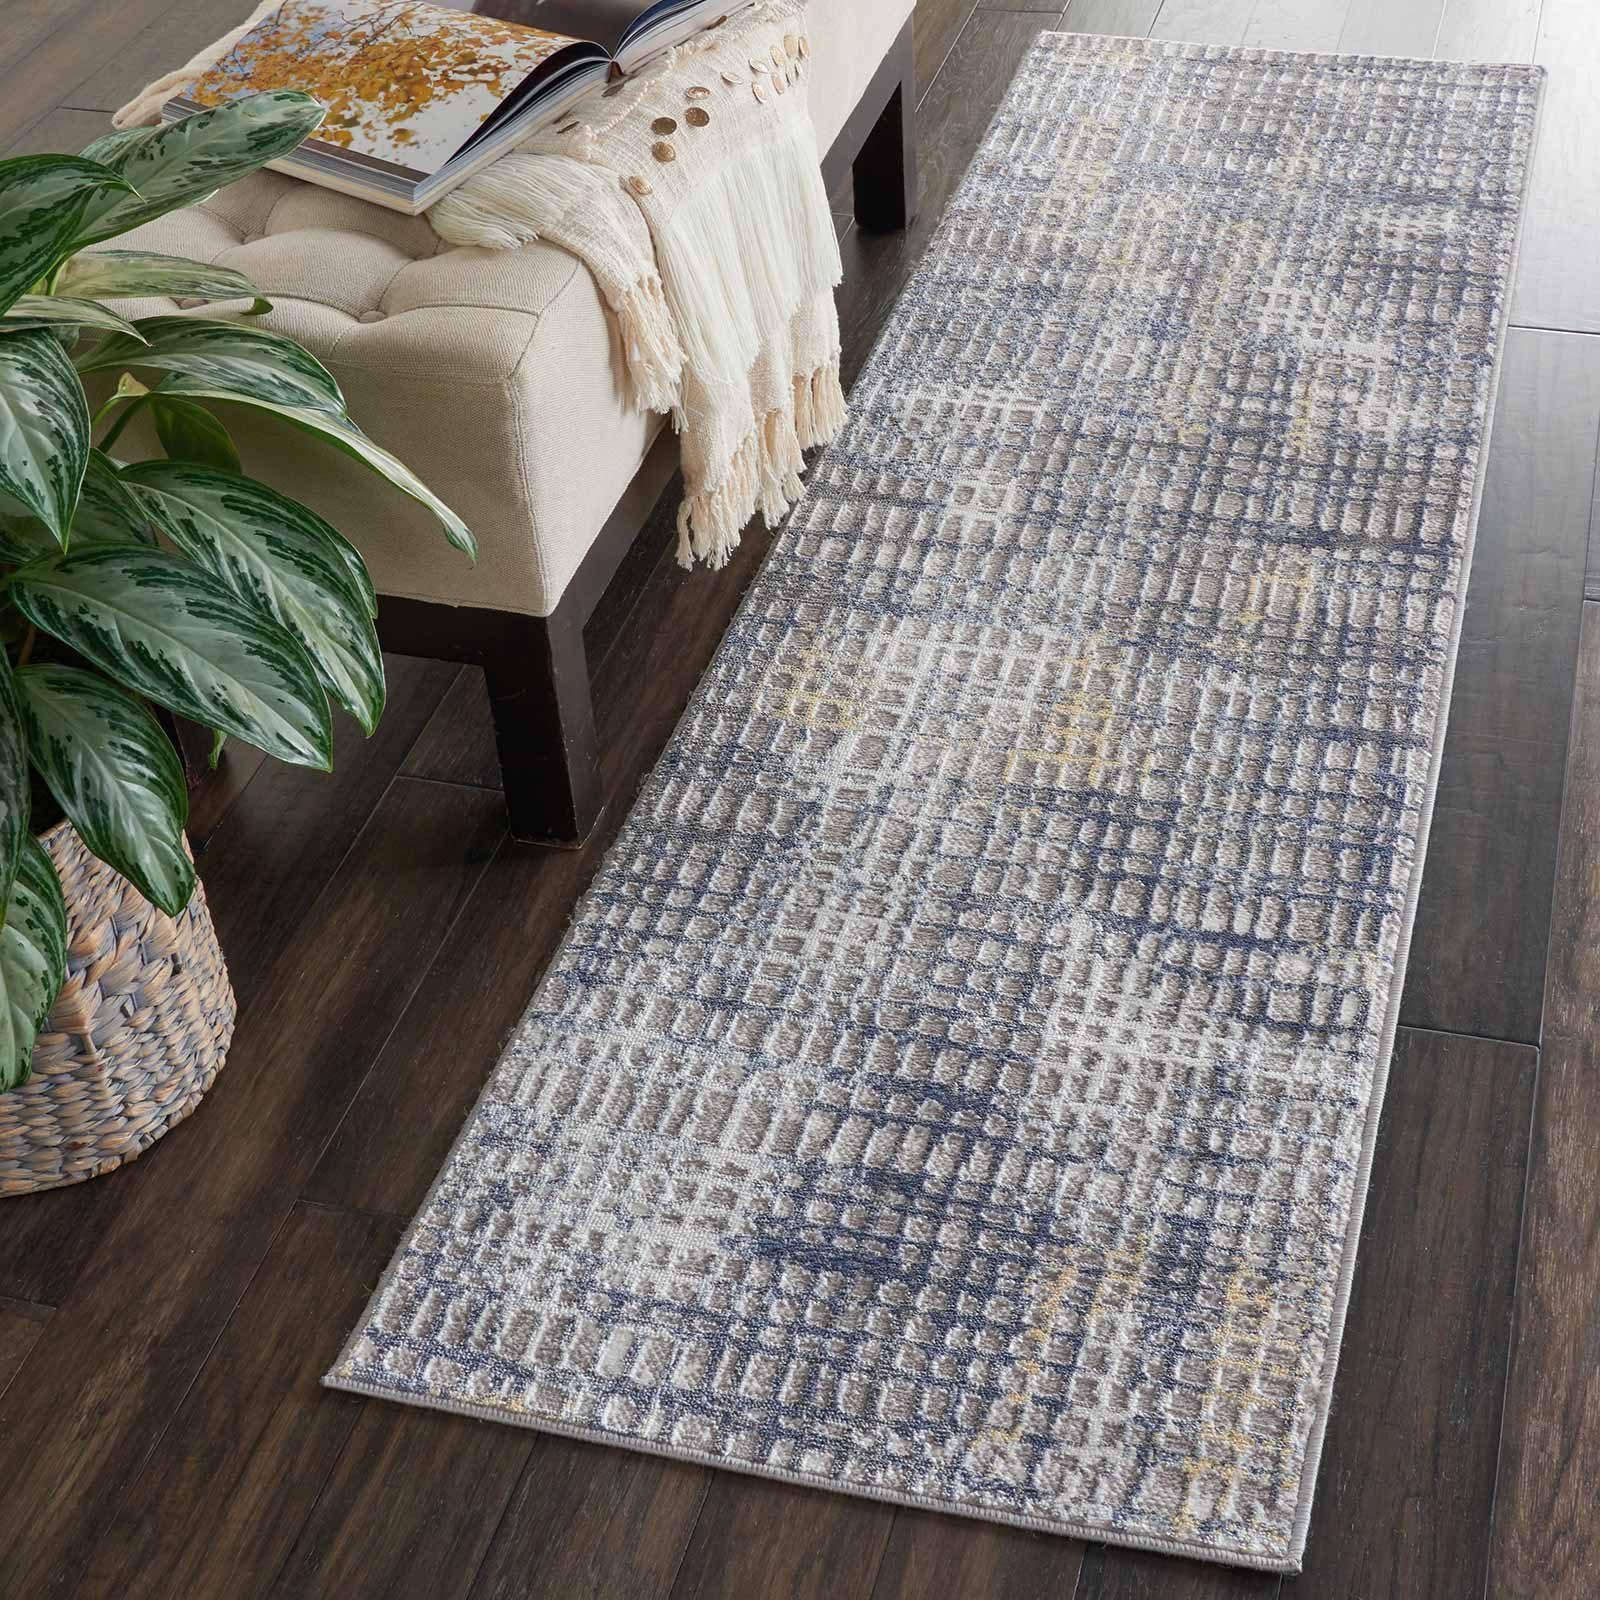 Nourison rug Urban Decor URD06 GRYIV 2X8 099446467195 interior 1 C